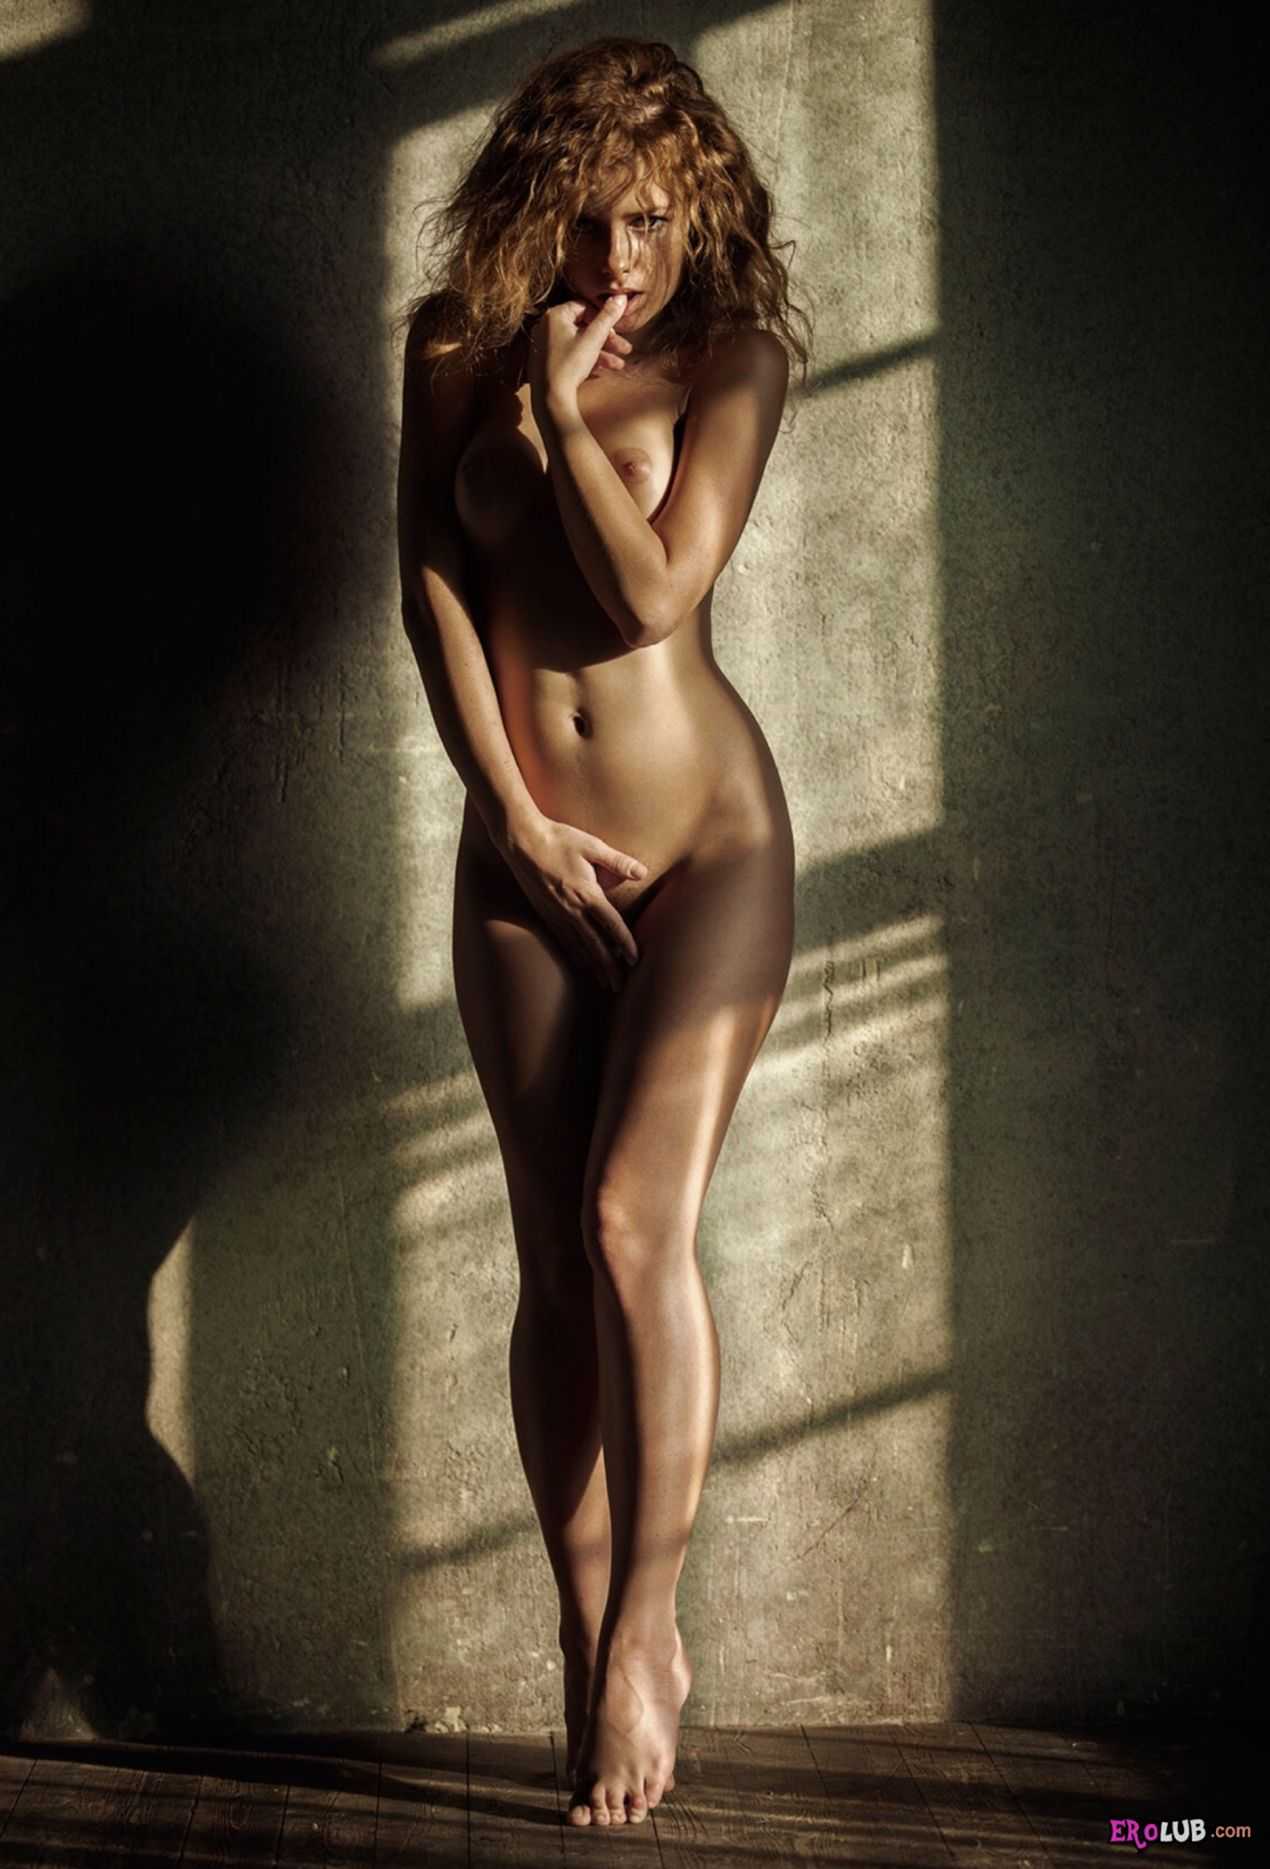 Качественная эротика на грани порно